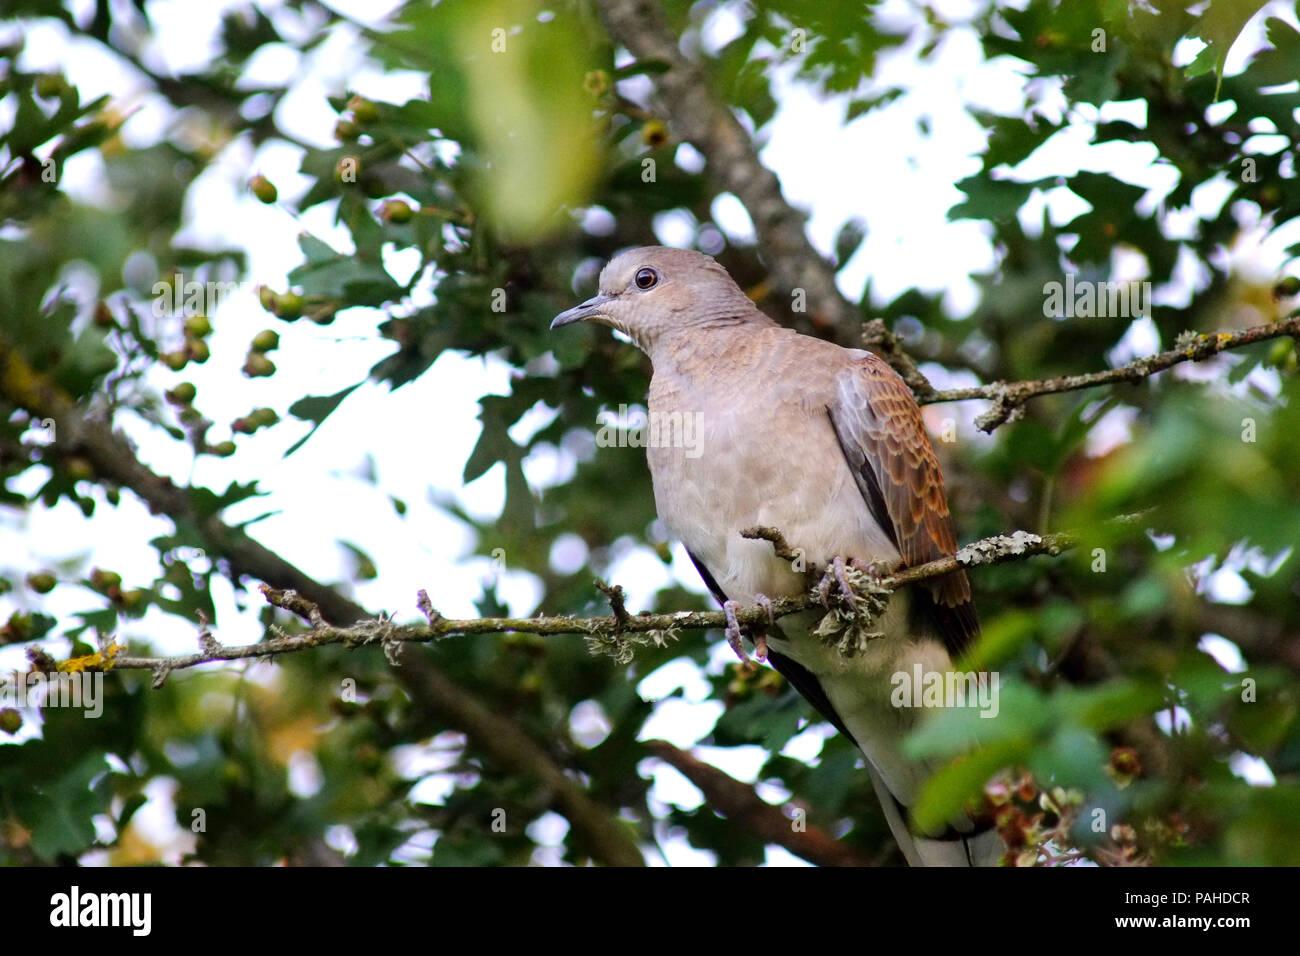 Turtle dove in the UK - Stock Image